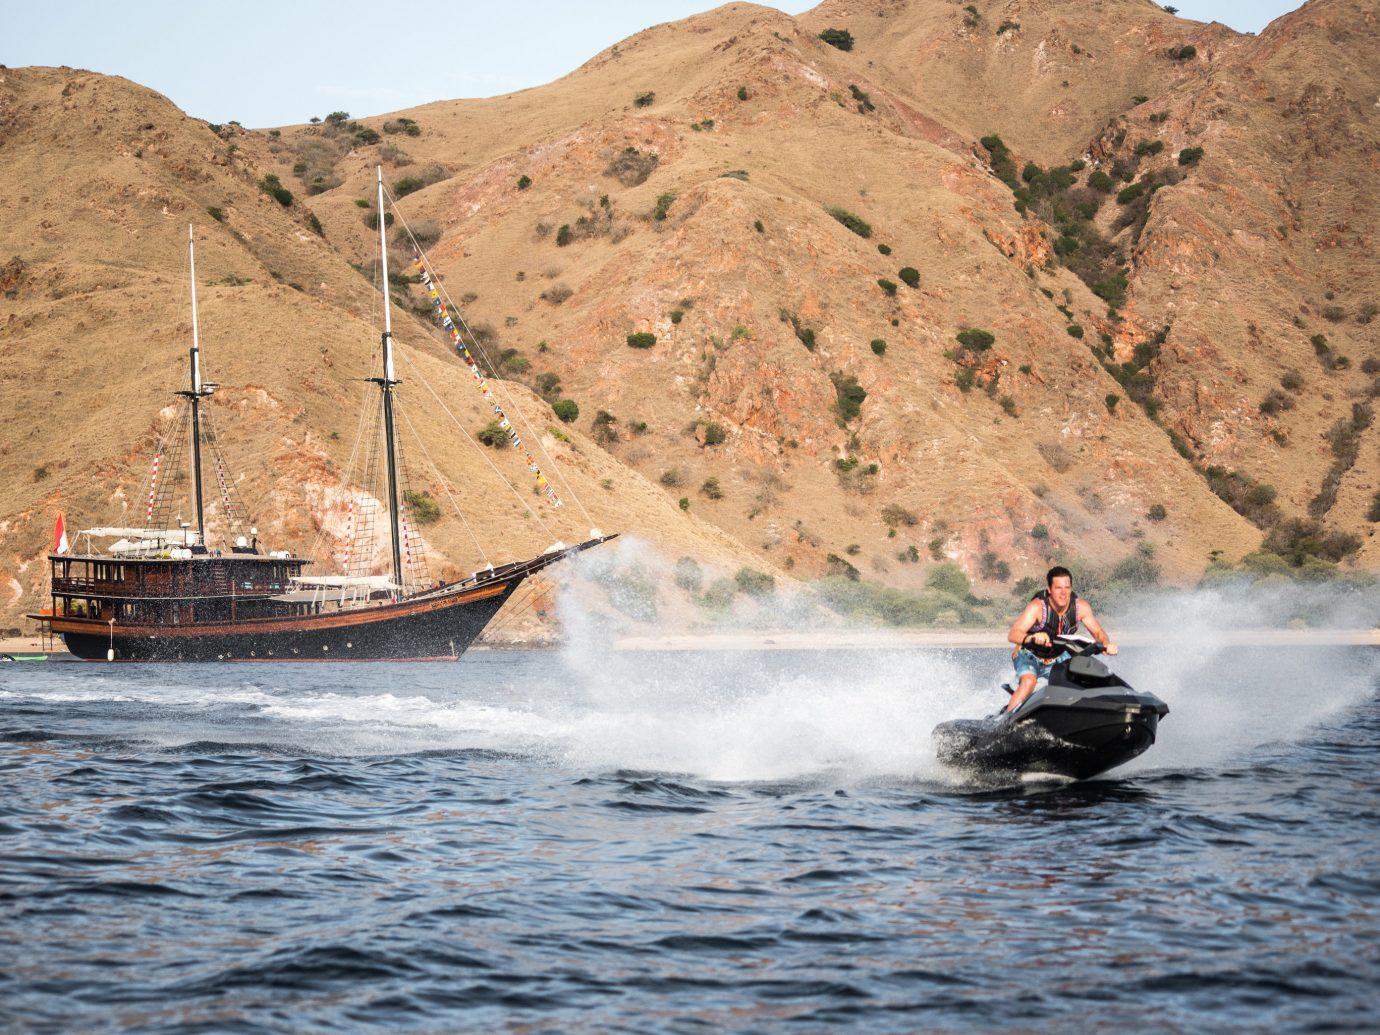 Luxury Travel Trip Ideas water transportation waterway Boat water watercraft boating vehicle motorboat lake district plant community tree